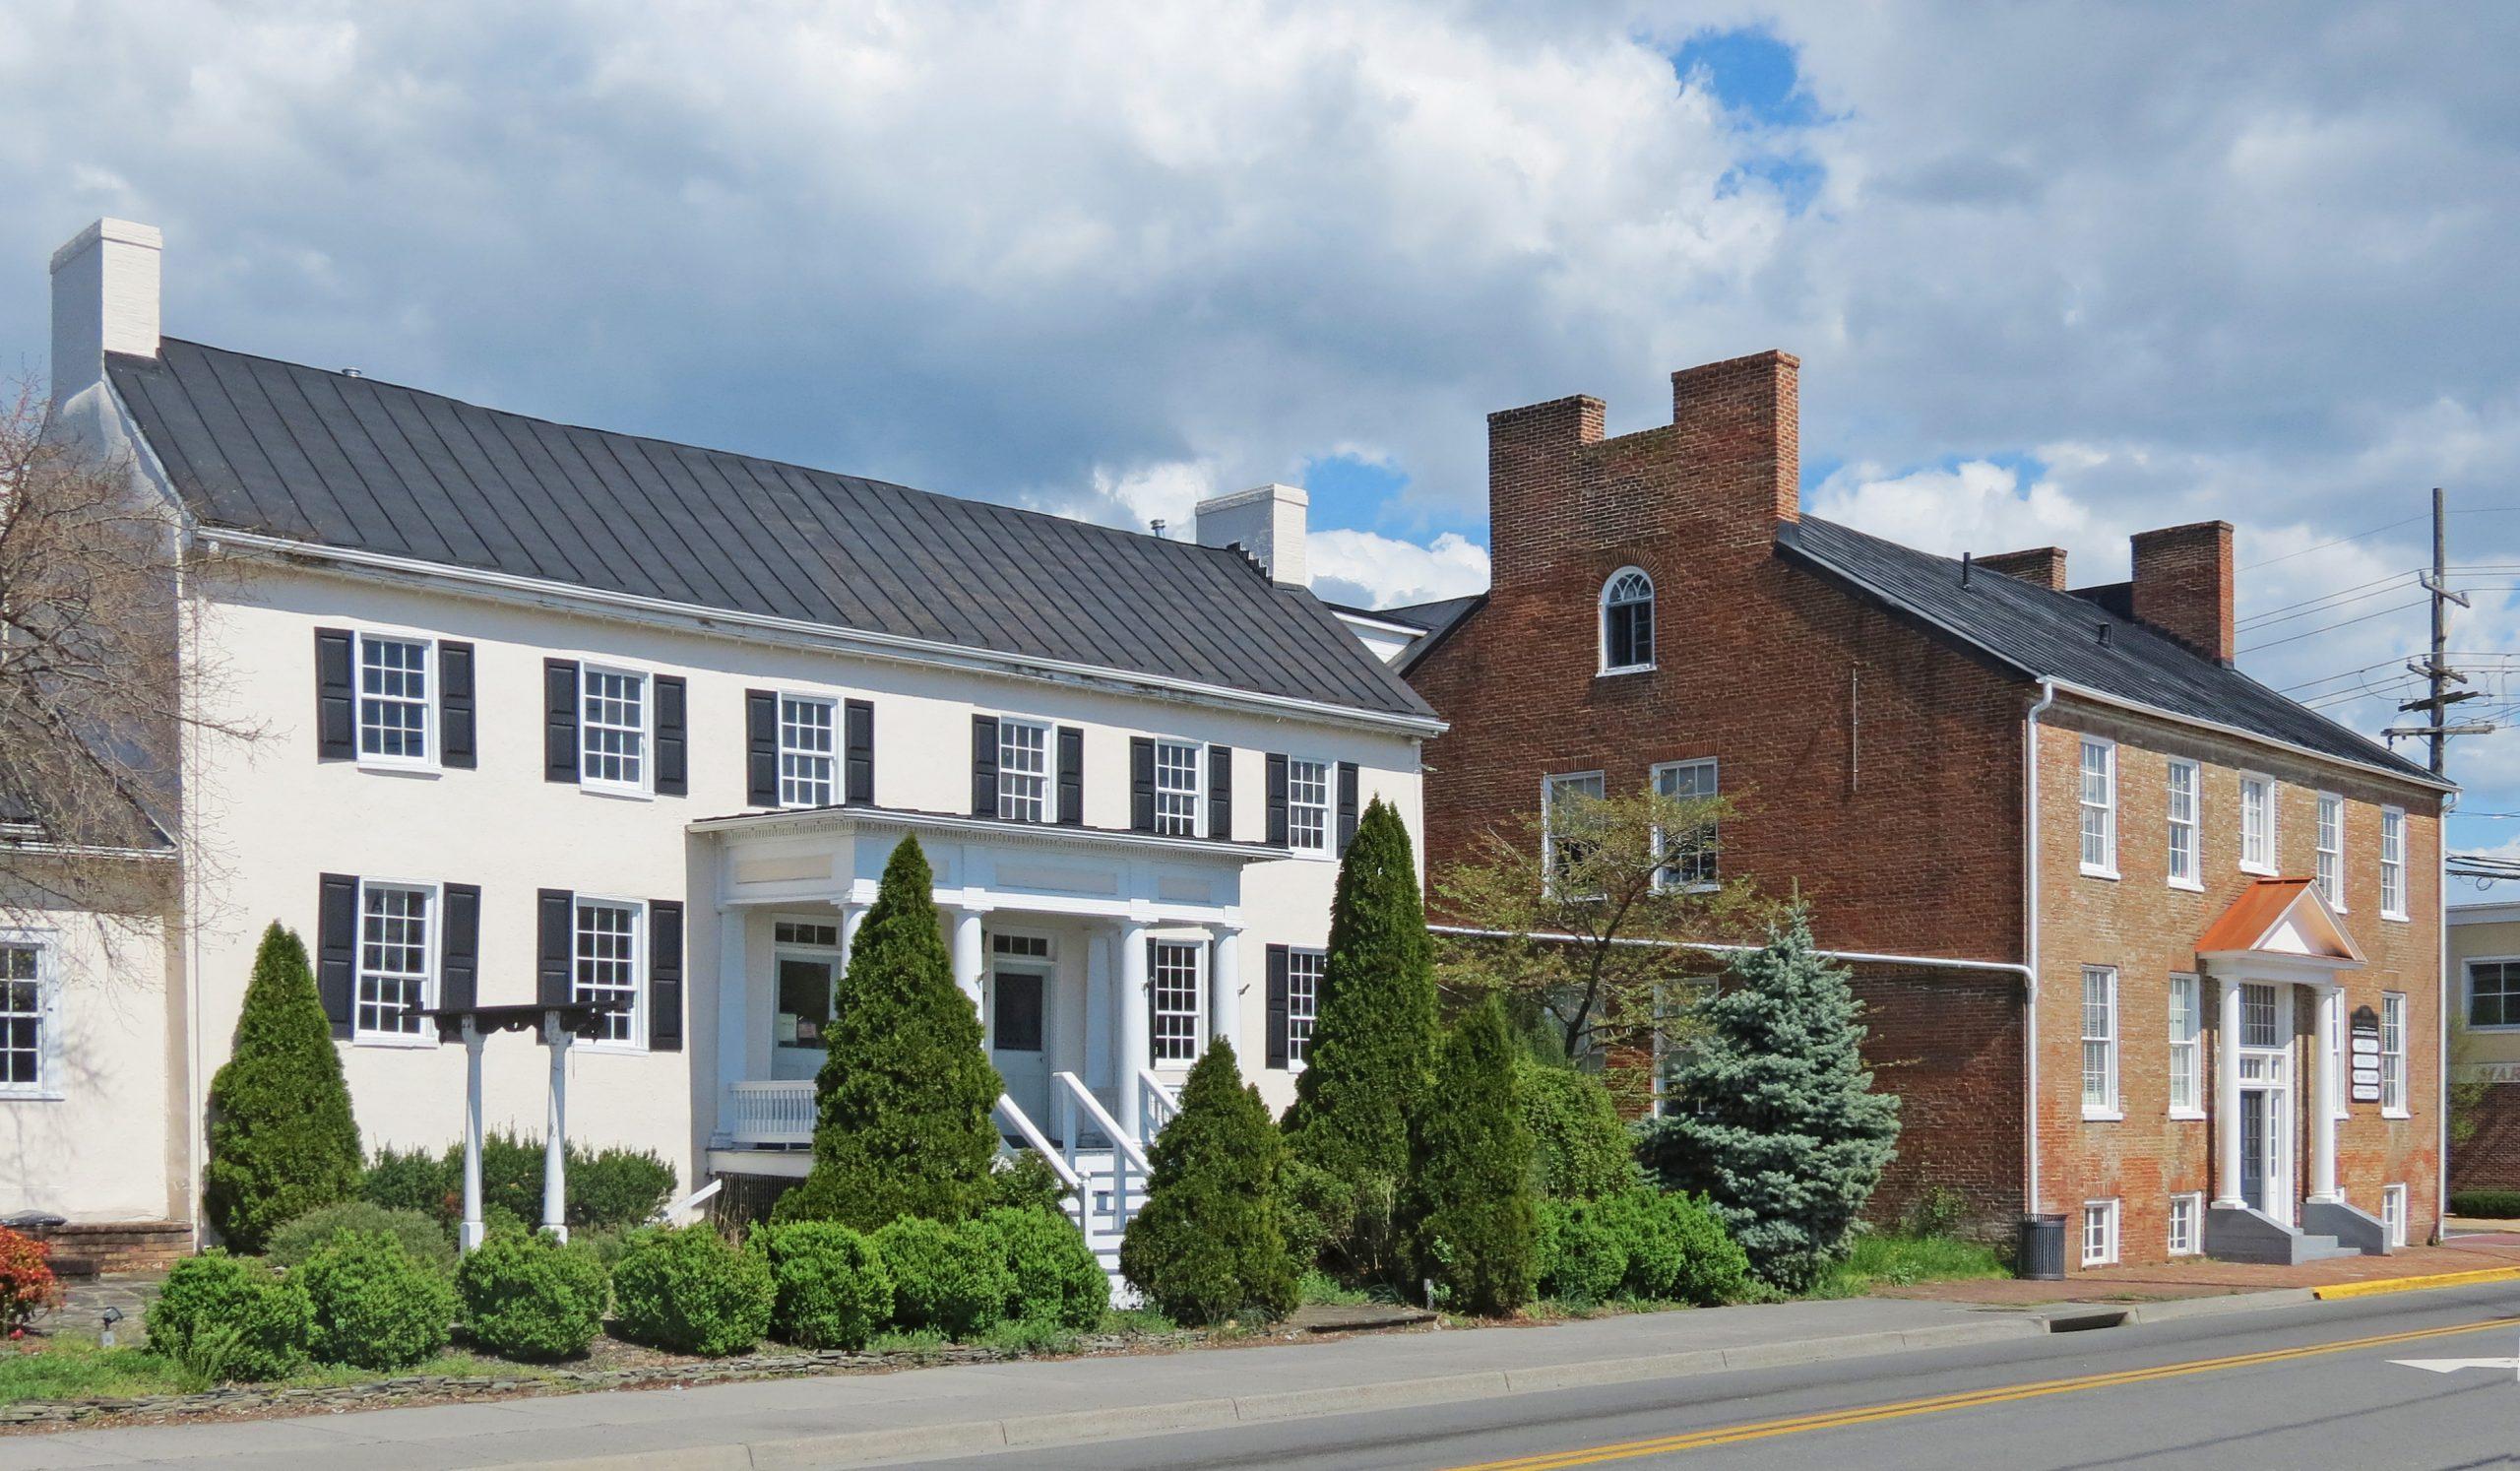 Berryville Historic District